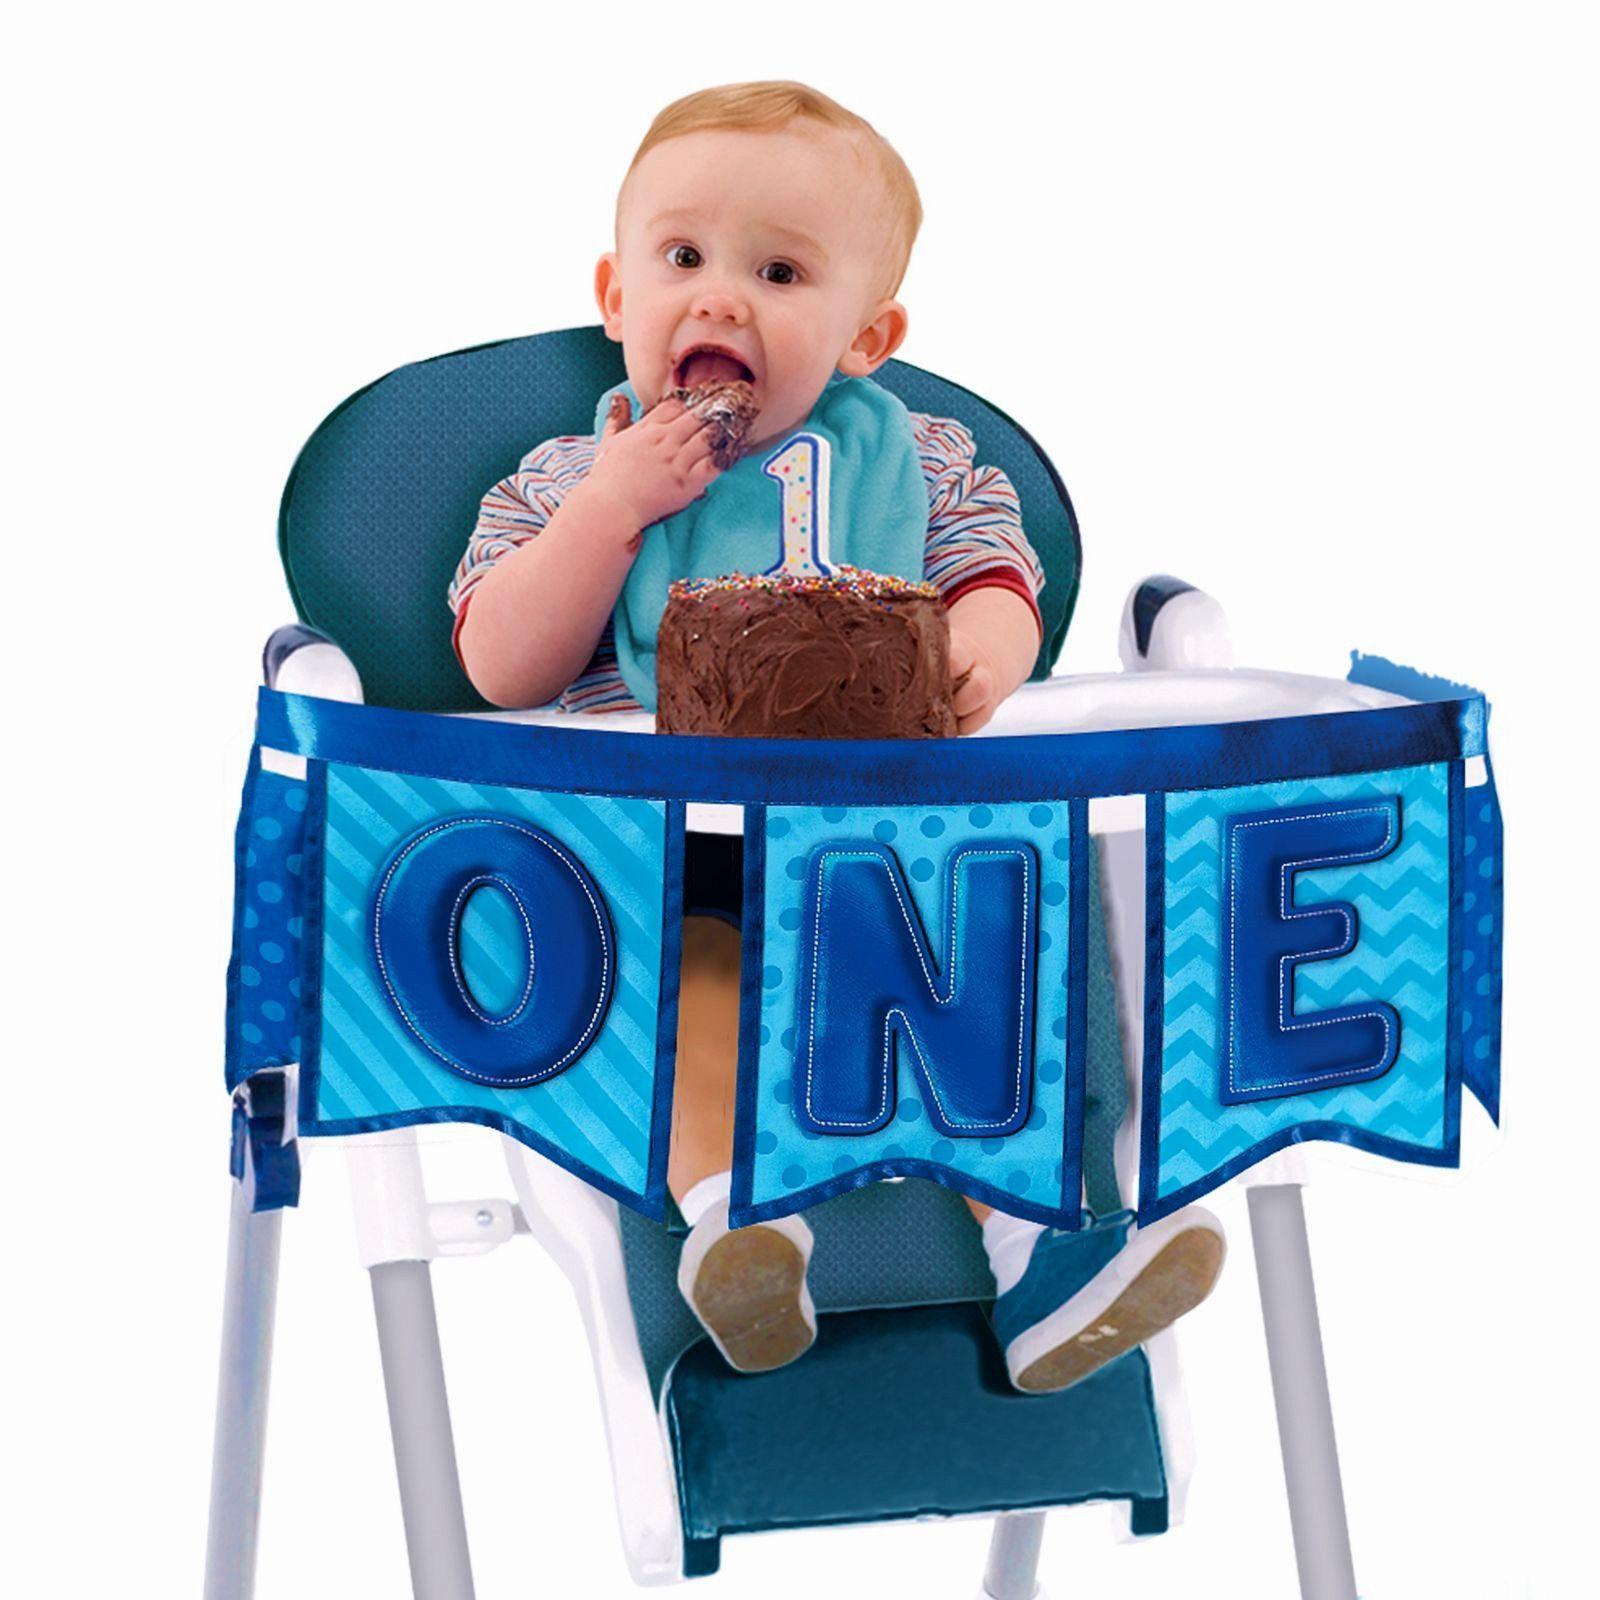 1st Birthday Boy High Chair Decorating Kit 1st Birthday Party Supplies 1st Boy Birthday High Chair Decorations